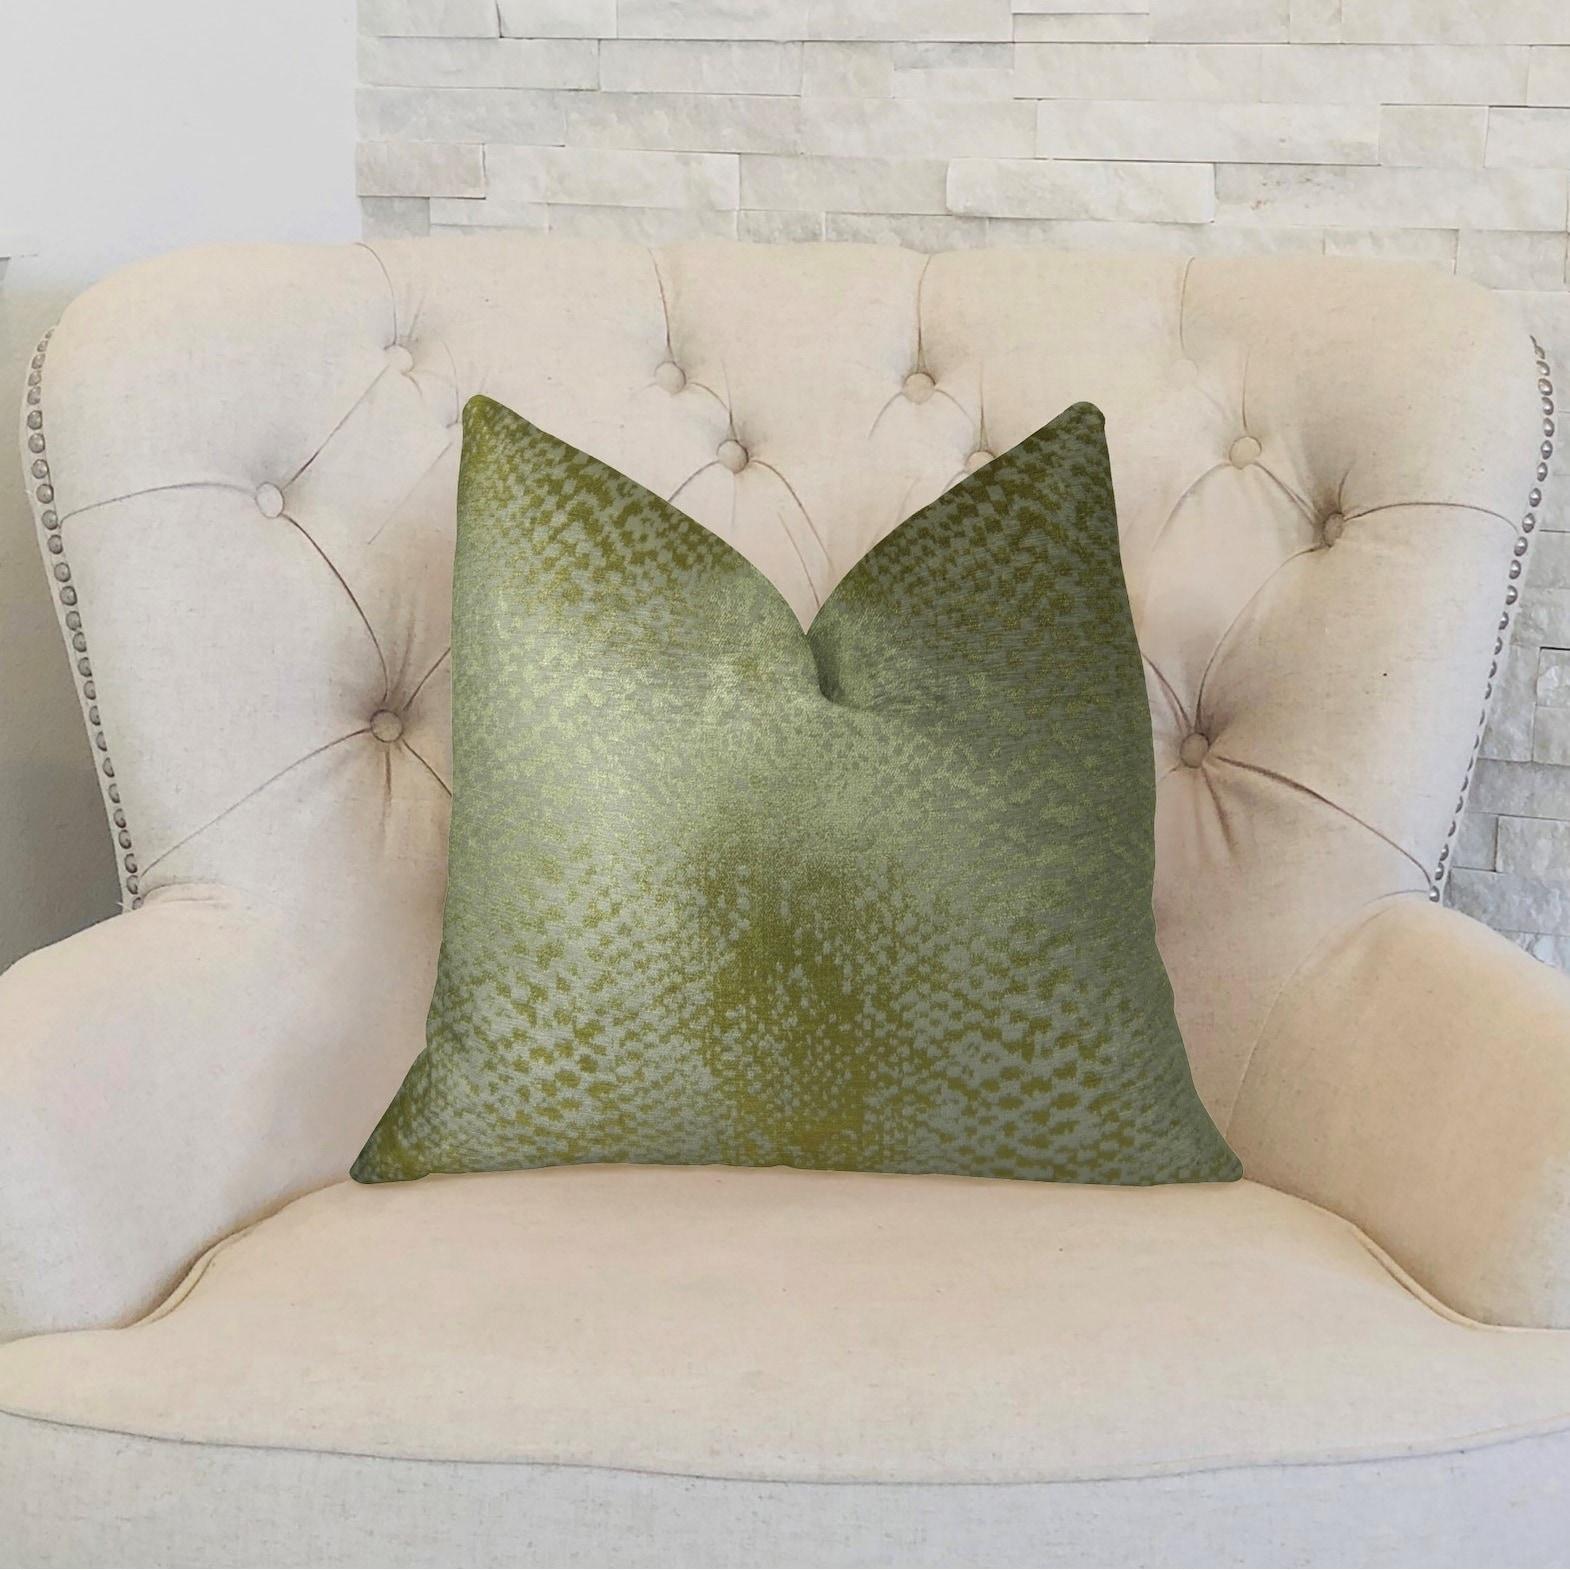 Plutus Venetian Gold Handmade Decorative Throw Pillow Overstock 21107297